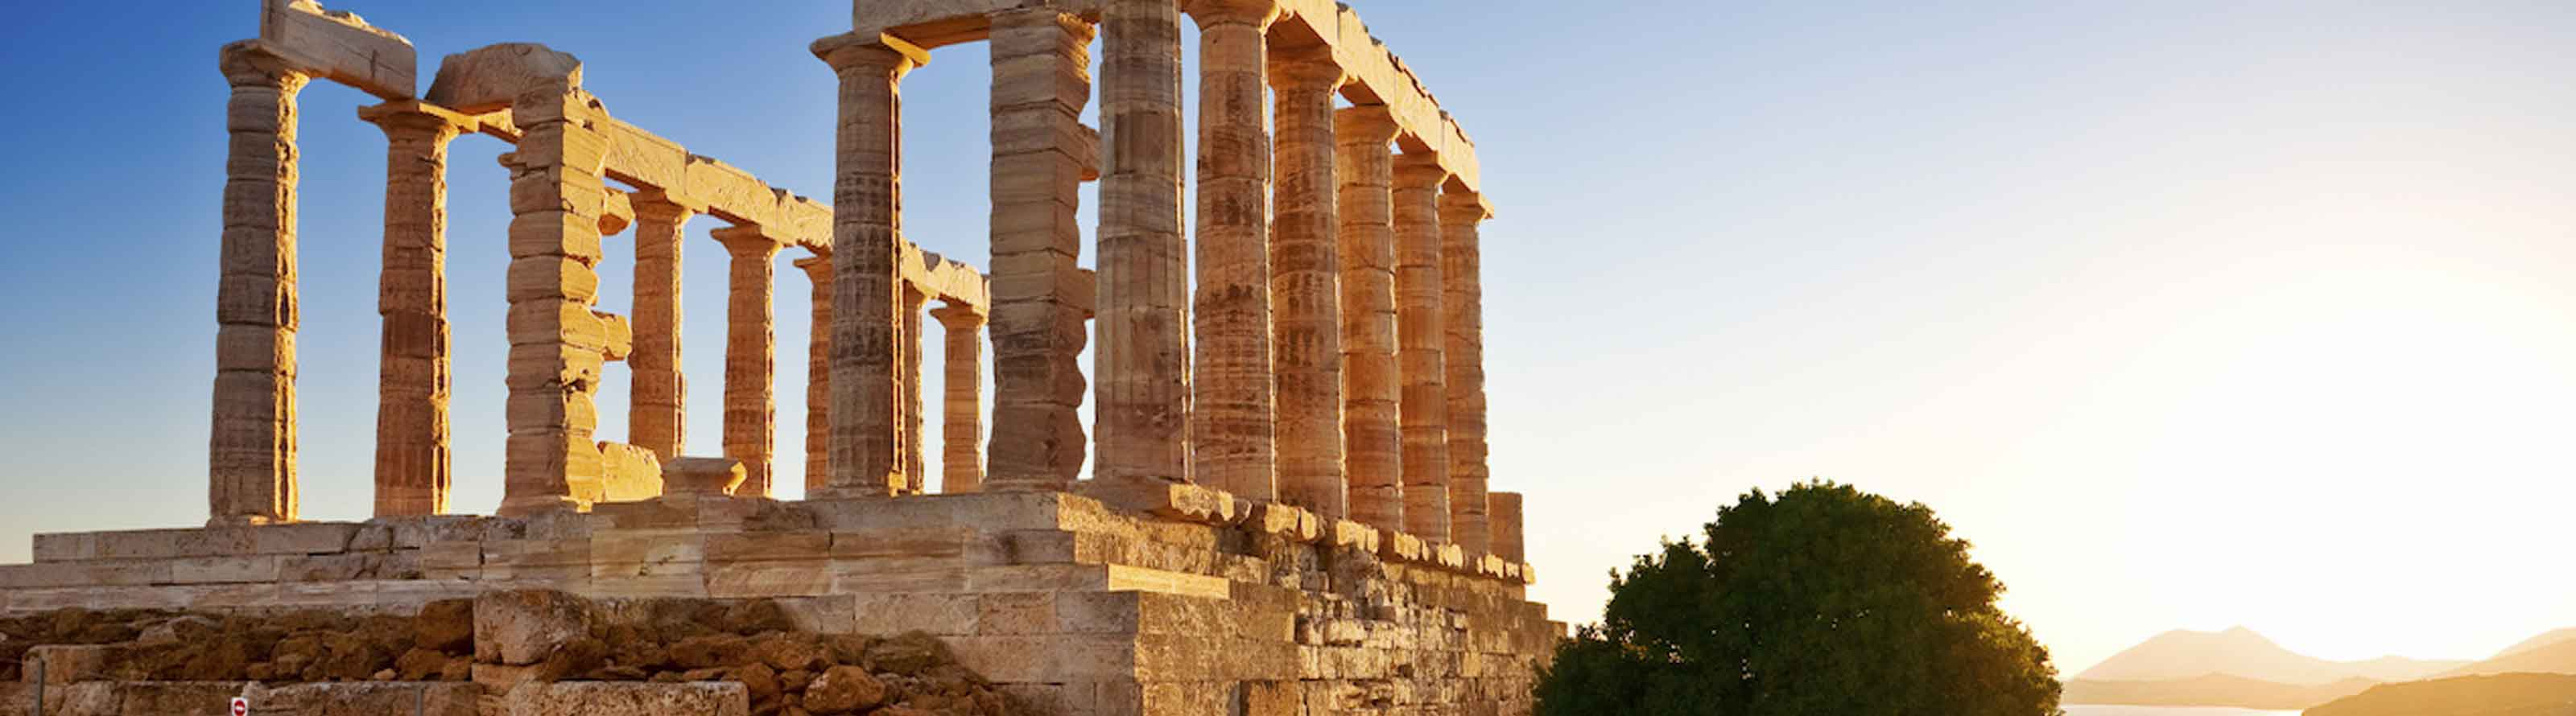 Ancient Greek Architecture Online Course | Oxford Royale Summer Schools